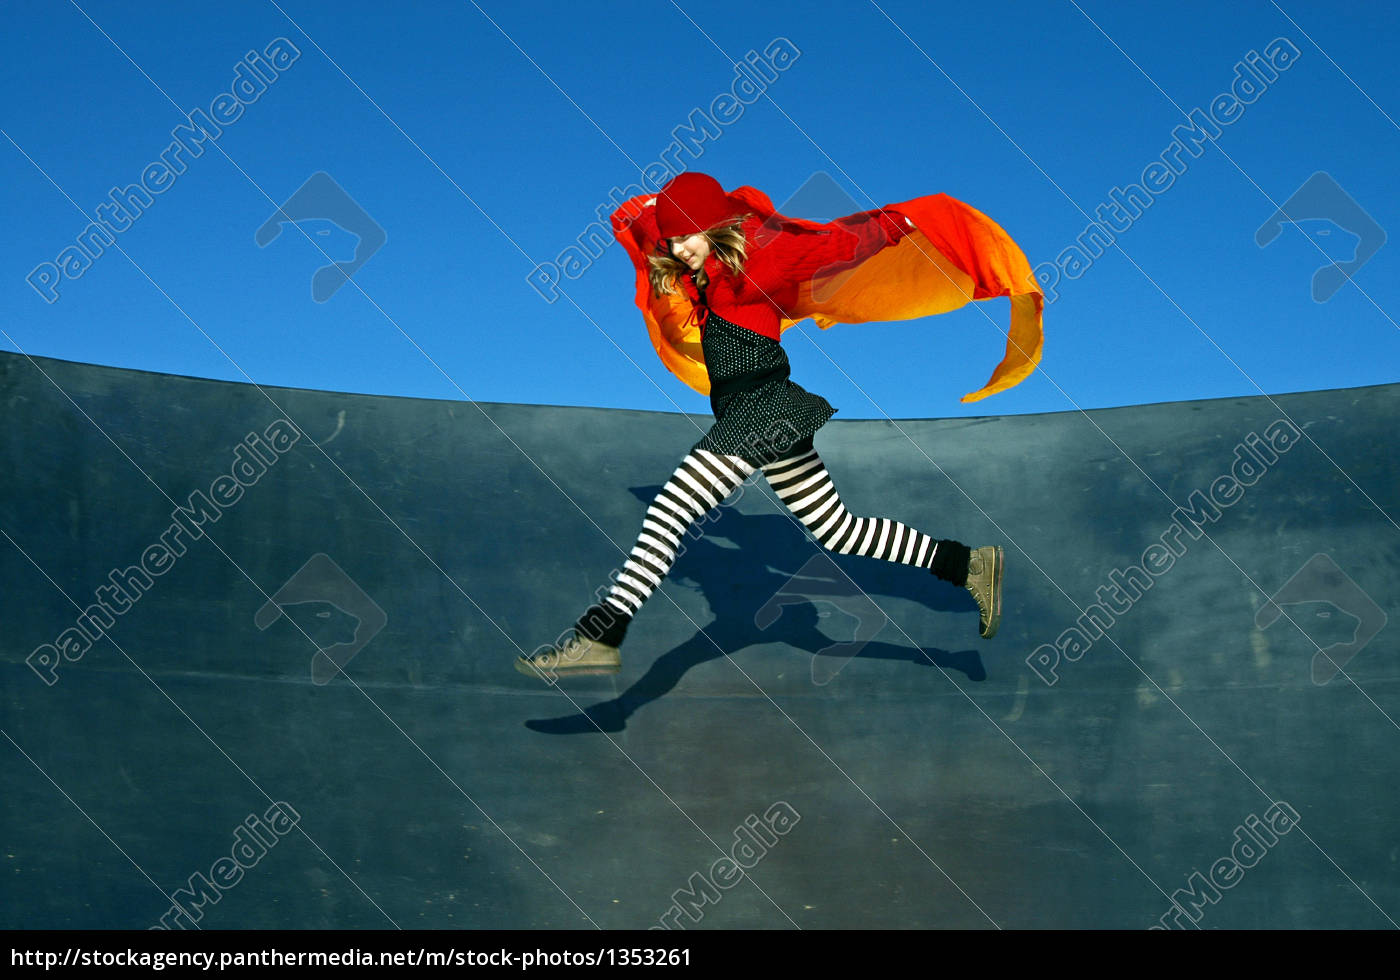 happy, jump - 1353261